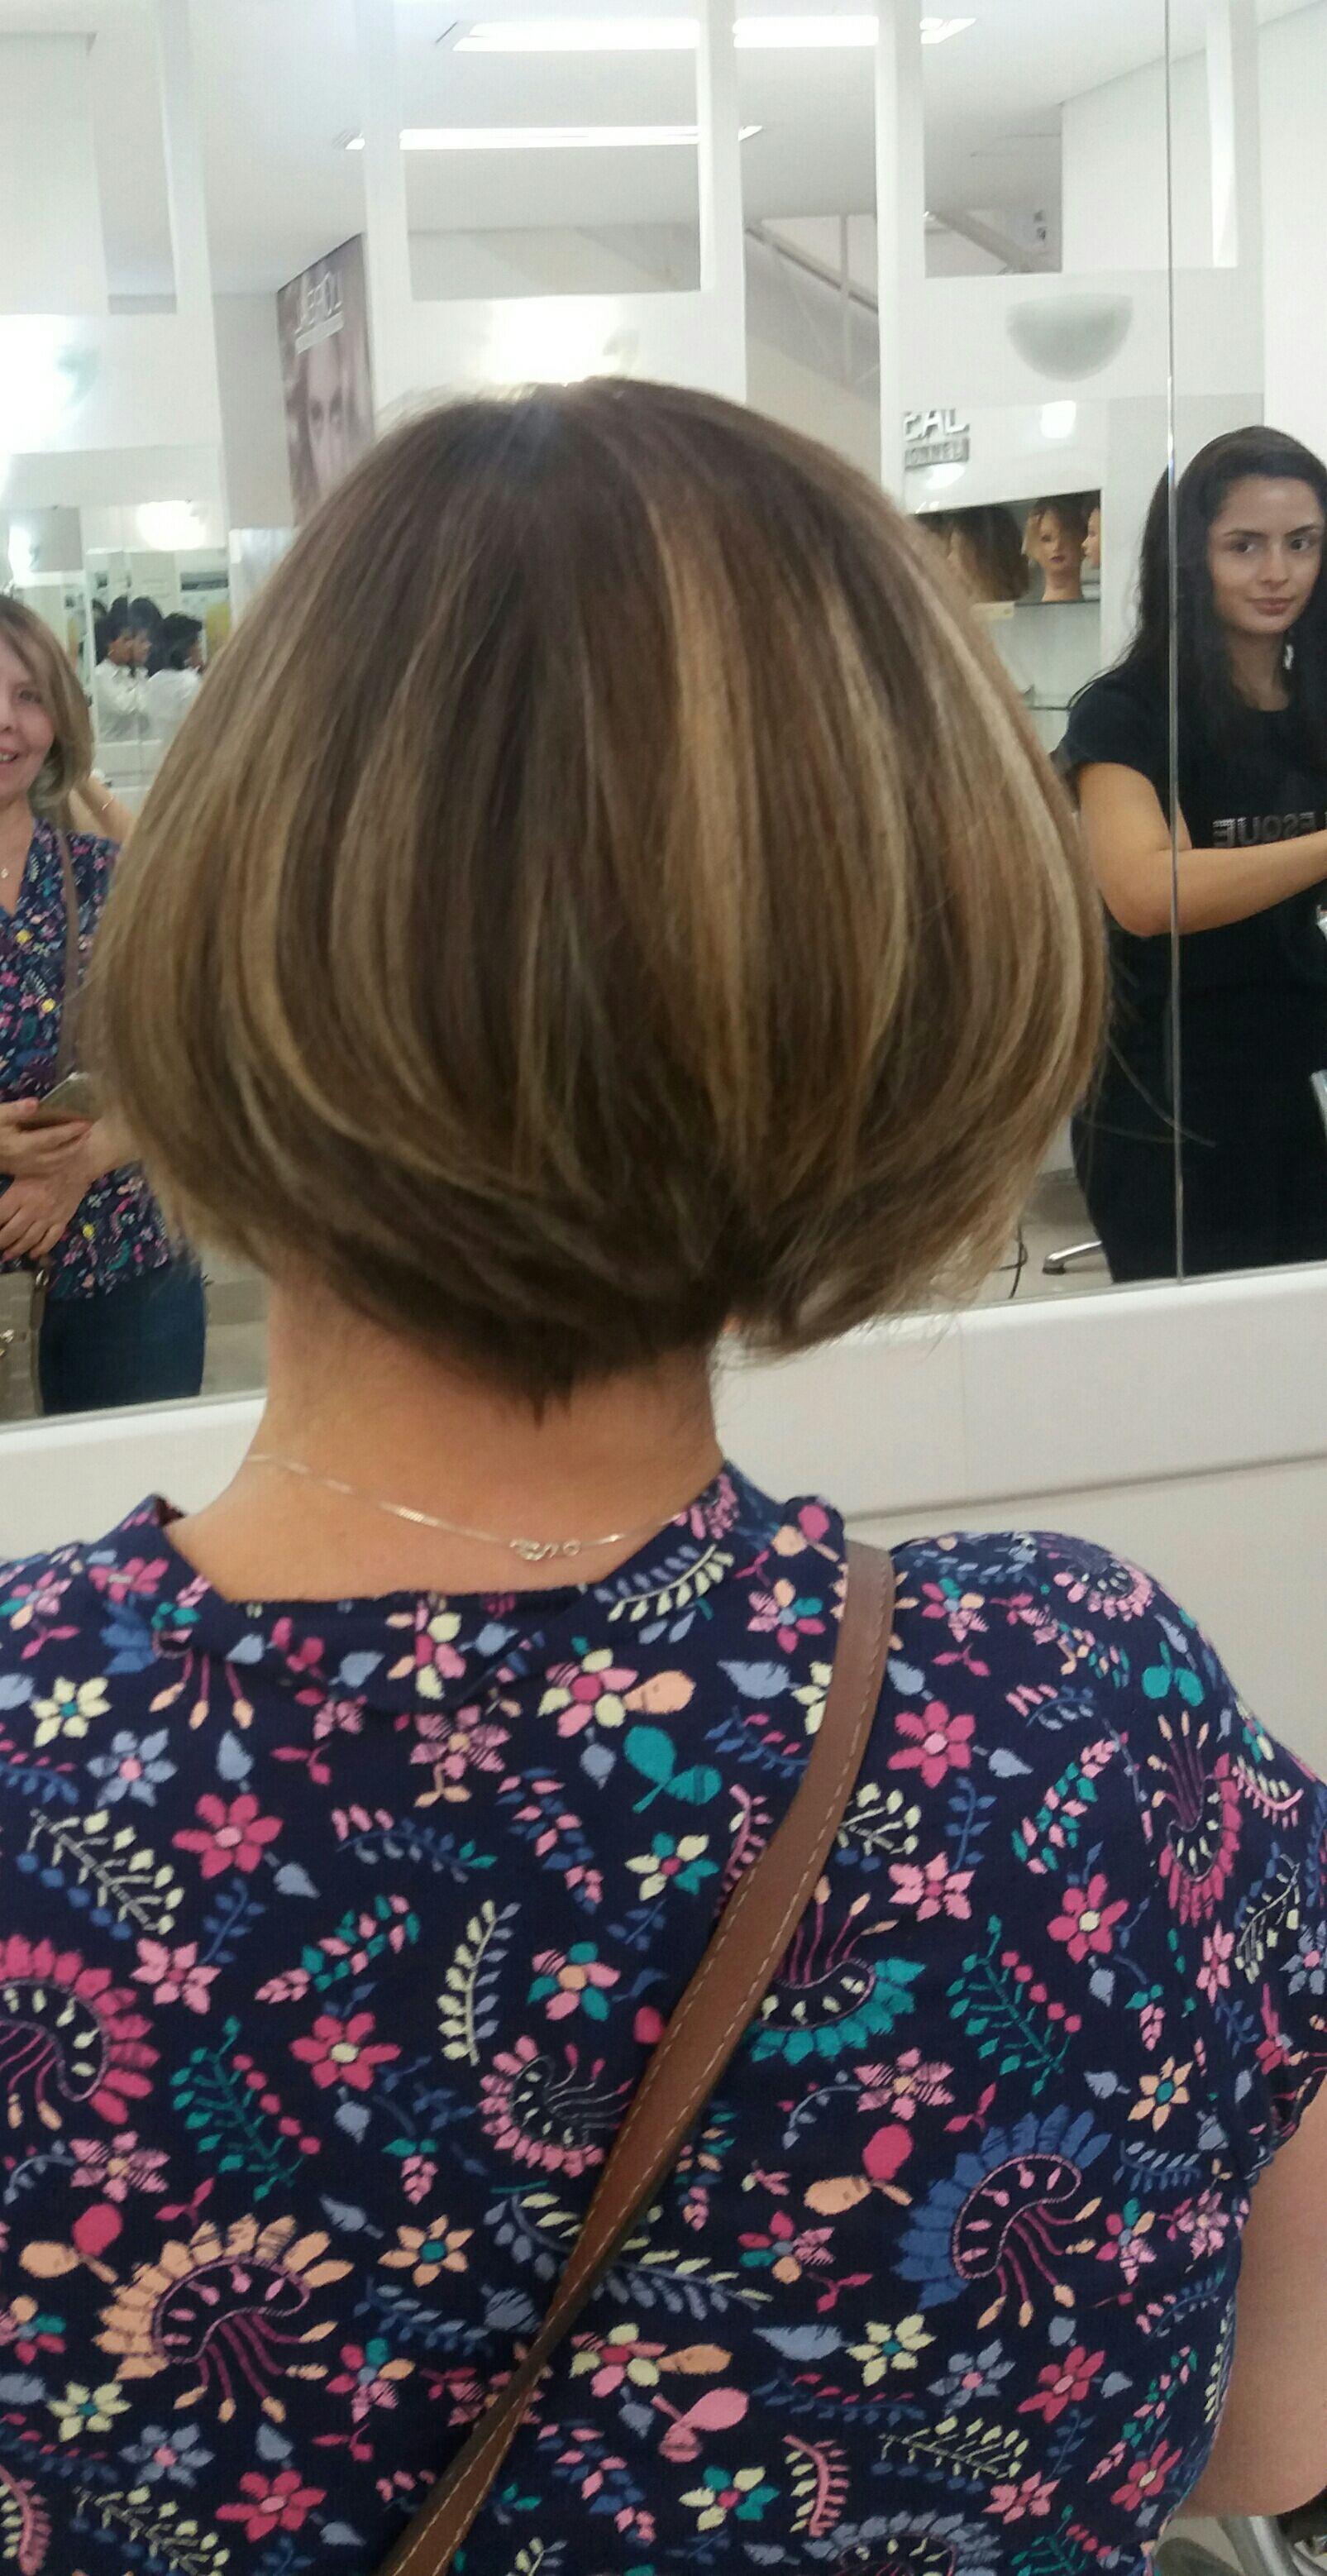 auxiliar cabeleireiro(a) auxiliar cabeleireiro(a) auxiliar cabeleireiro(a) auxiliar cabeleireiro(a)